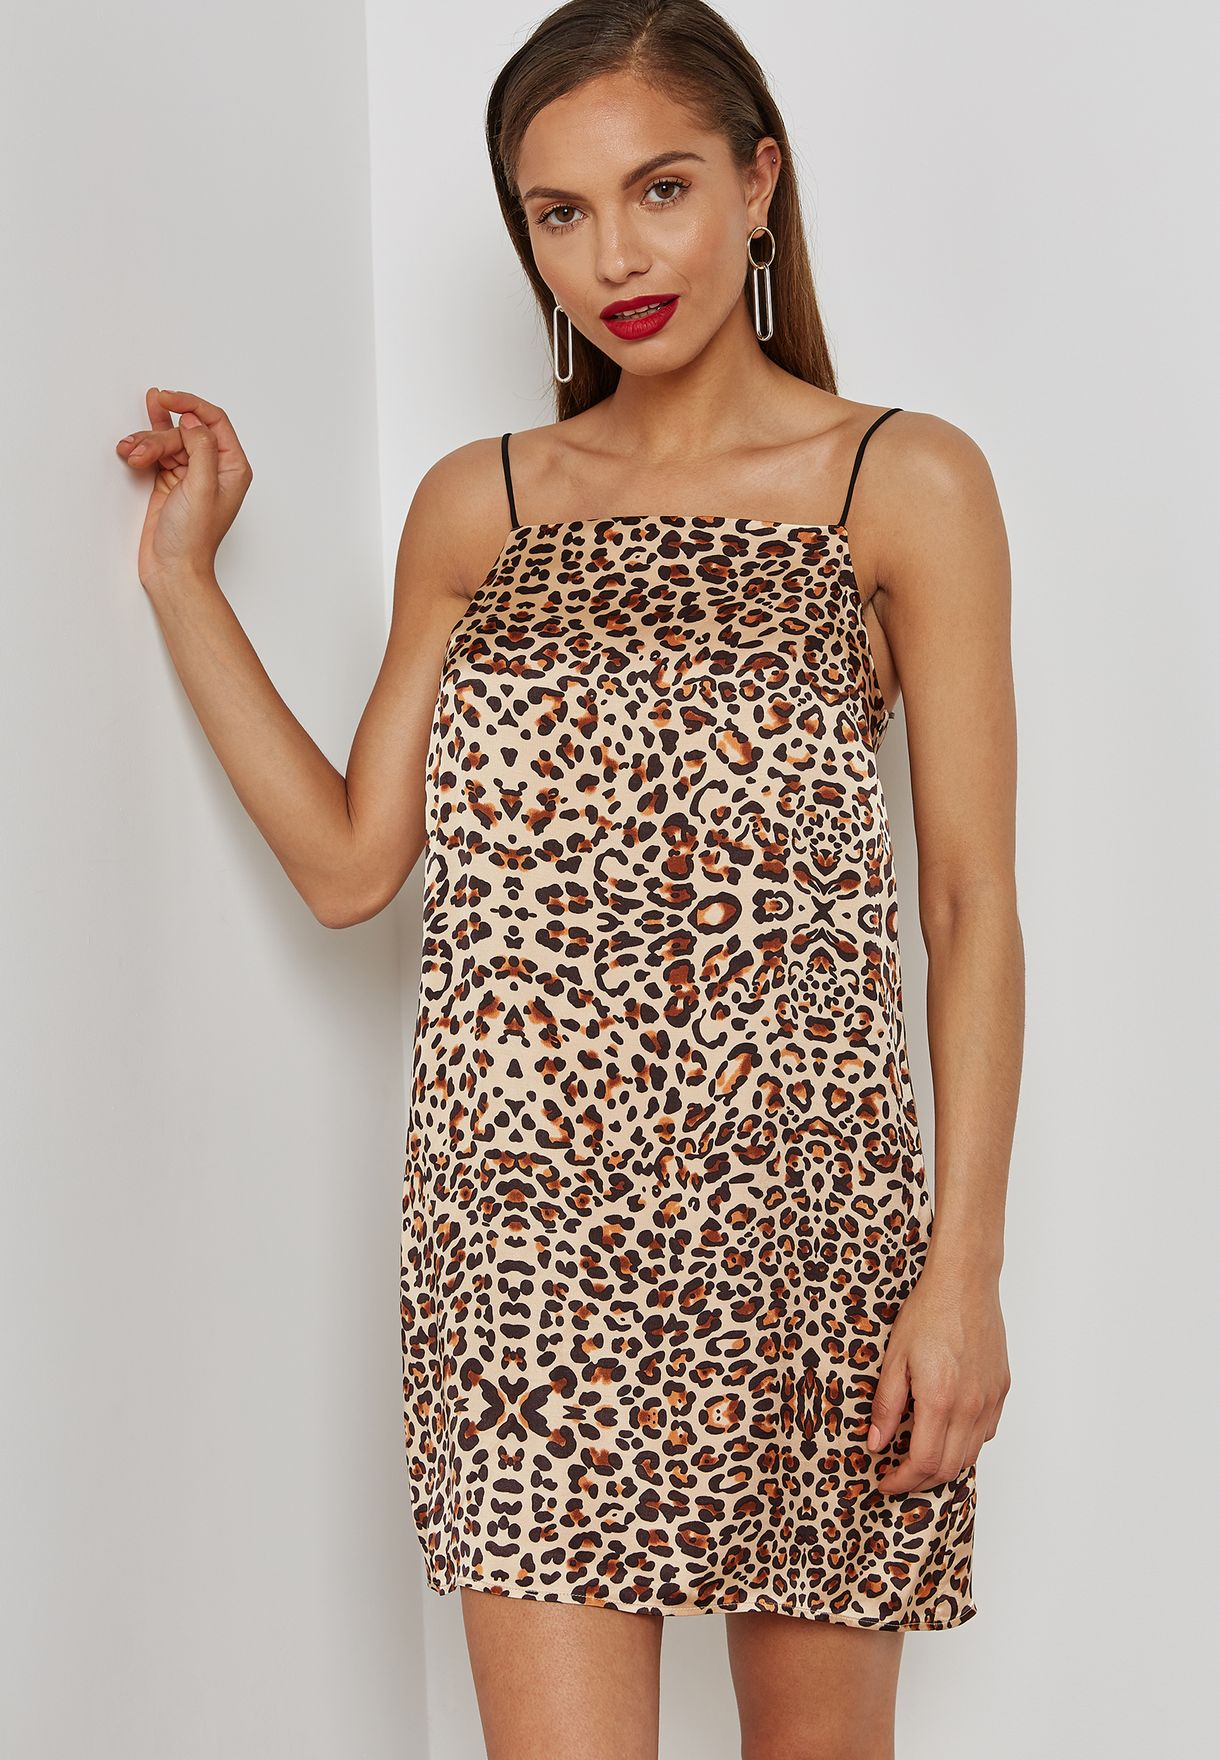 3f8a83508281 Shop Topshop prints Leopard Print Slip Dress 10H10NMUL for Women in ...